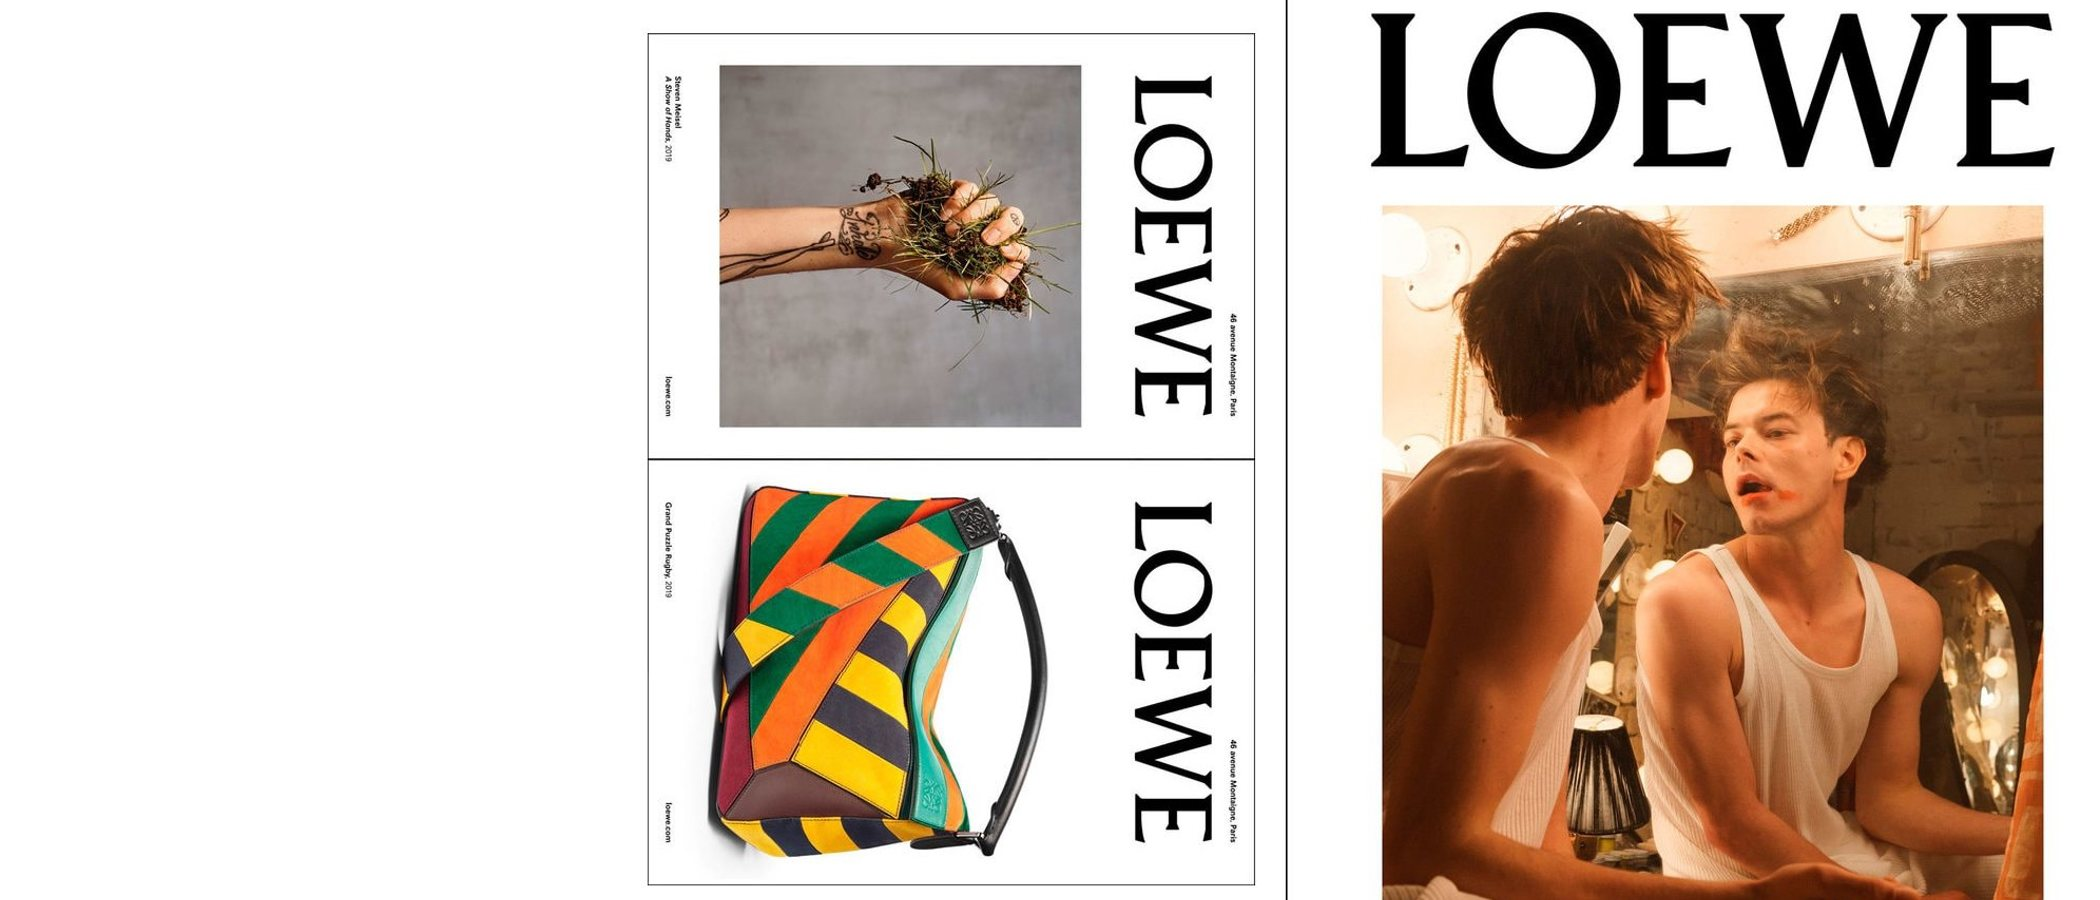 Loewe sucumbe al atractivo de Stranger Things para primavera 2020